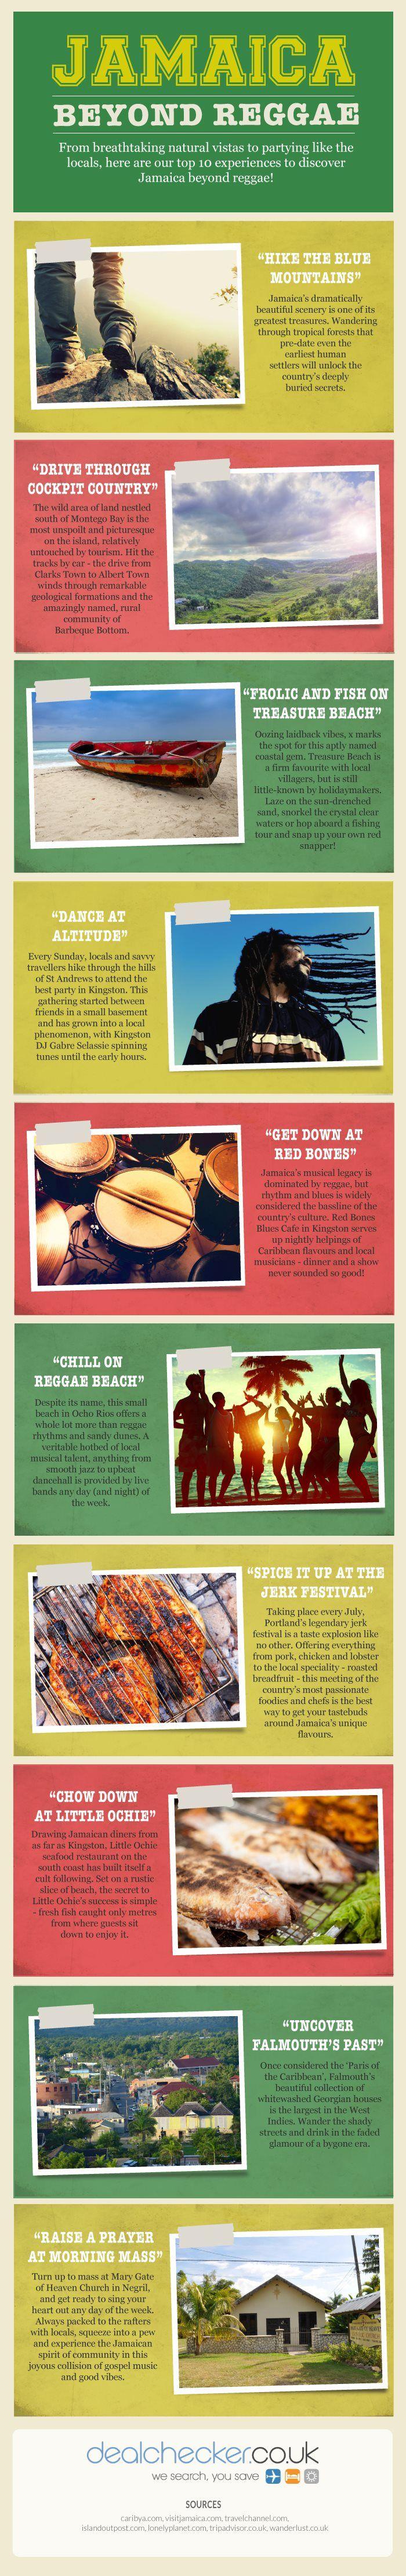 Jamaica: Beyond Reggae